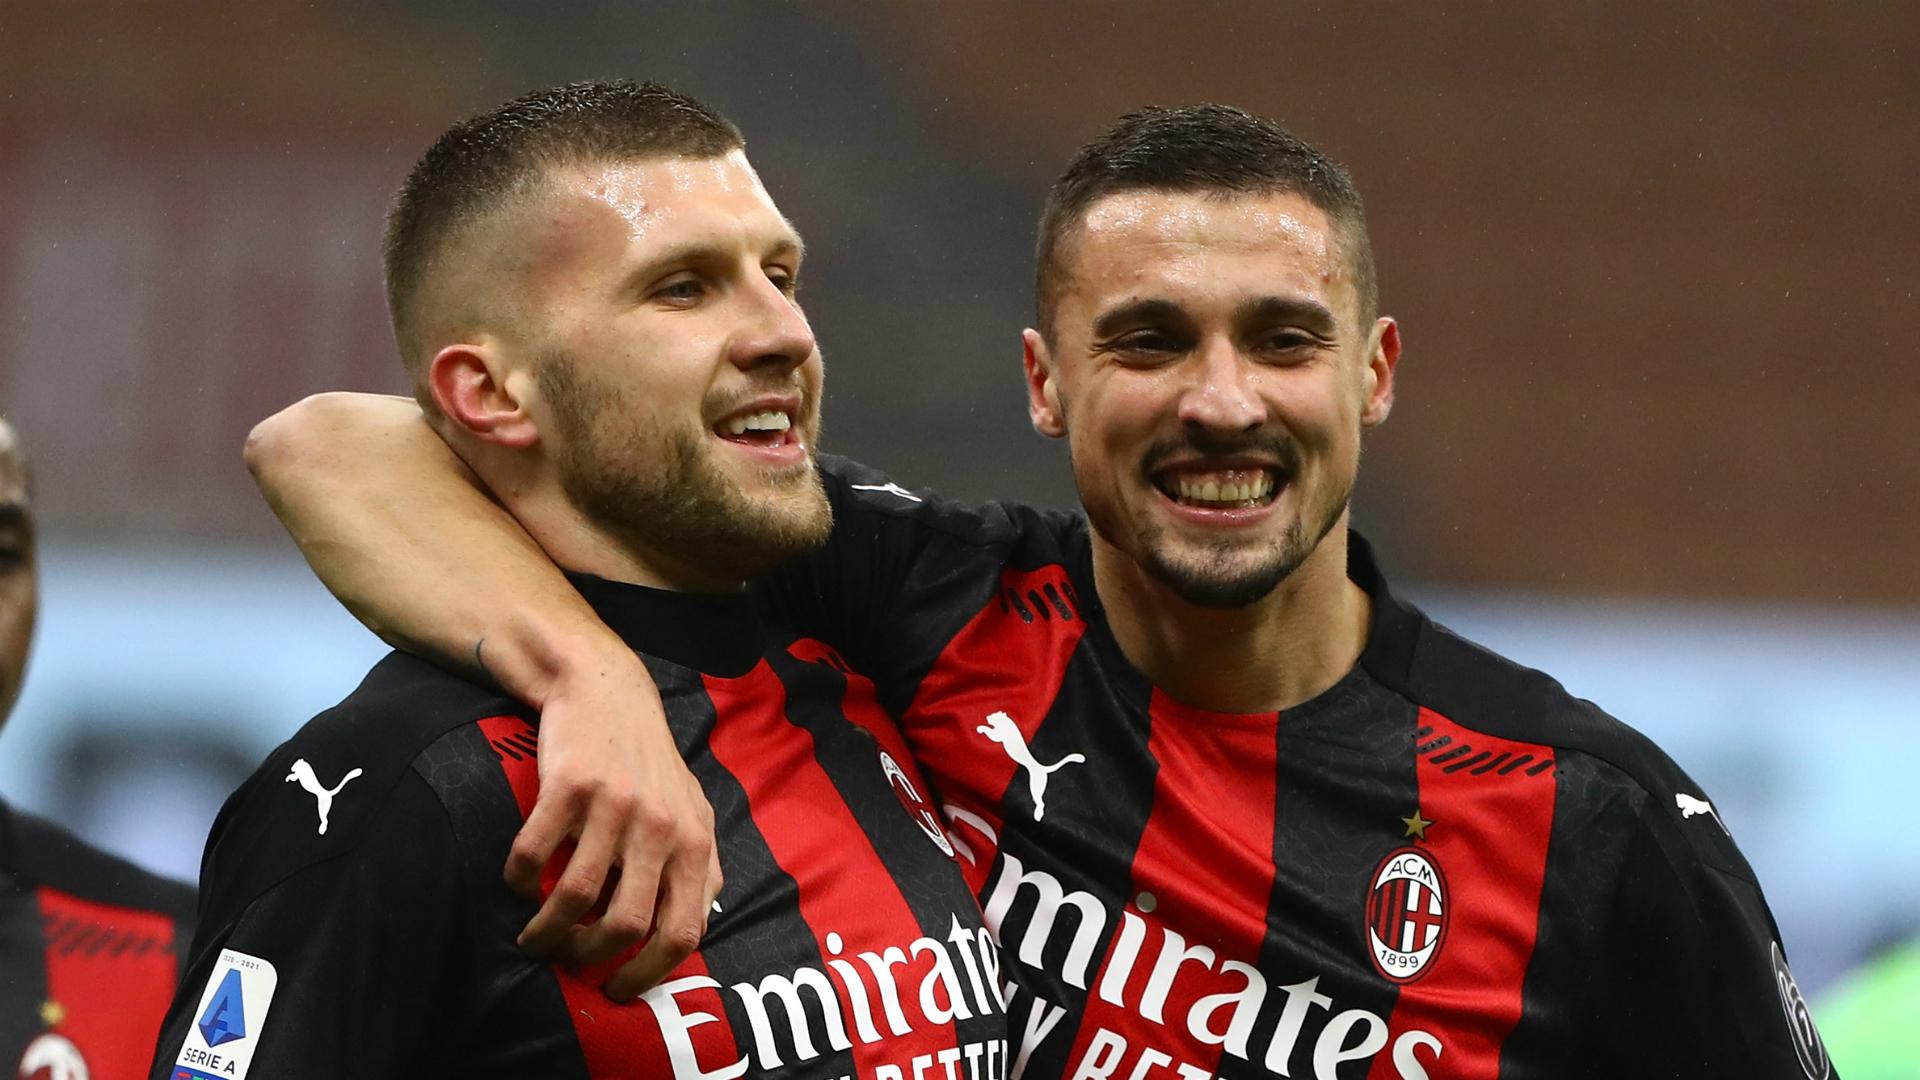 Milan pair Rebic and Krunic test positive for coronavirus ahead of Juventus clash